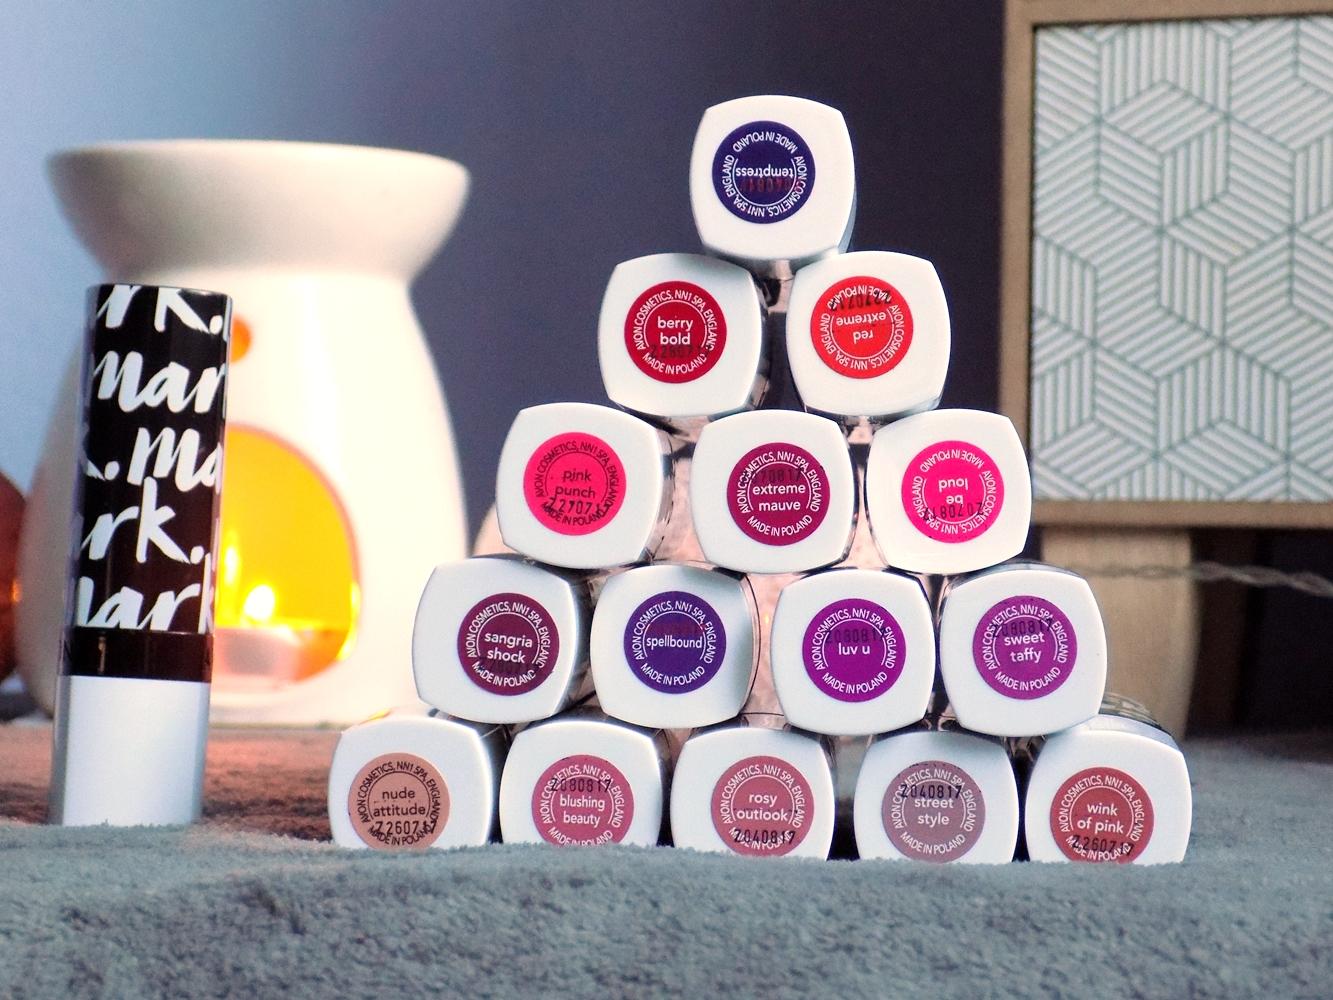 #49 Avon mark - Epic Lip Lipstick - 16 kolorów + swatche!